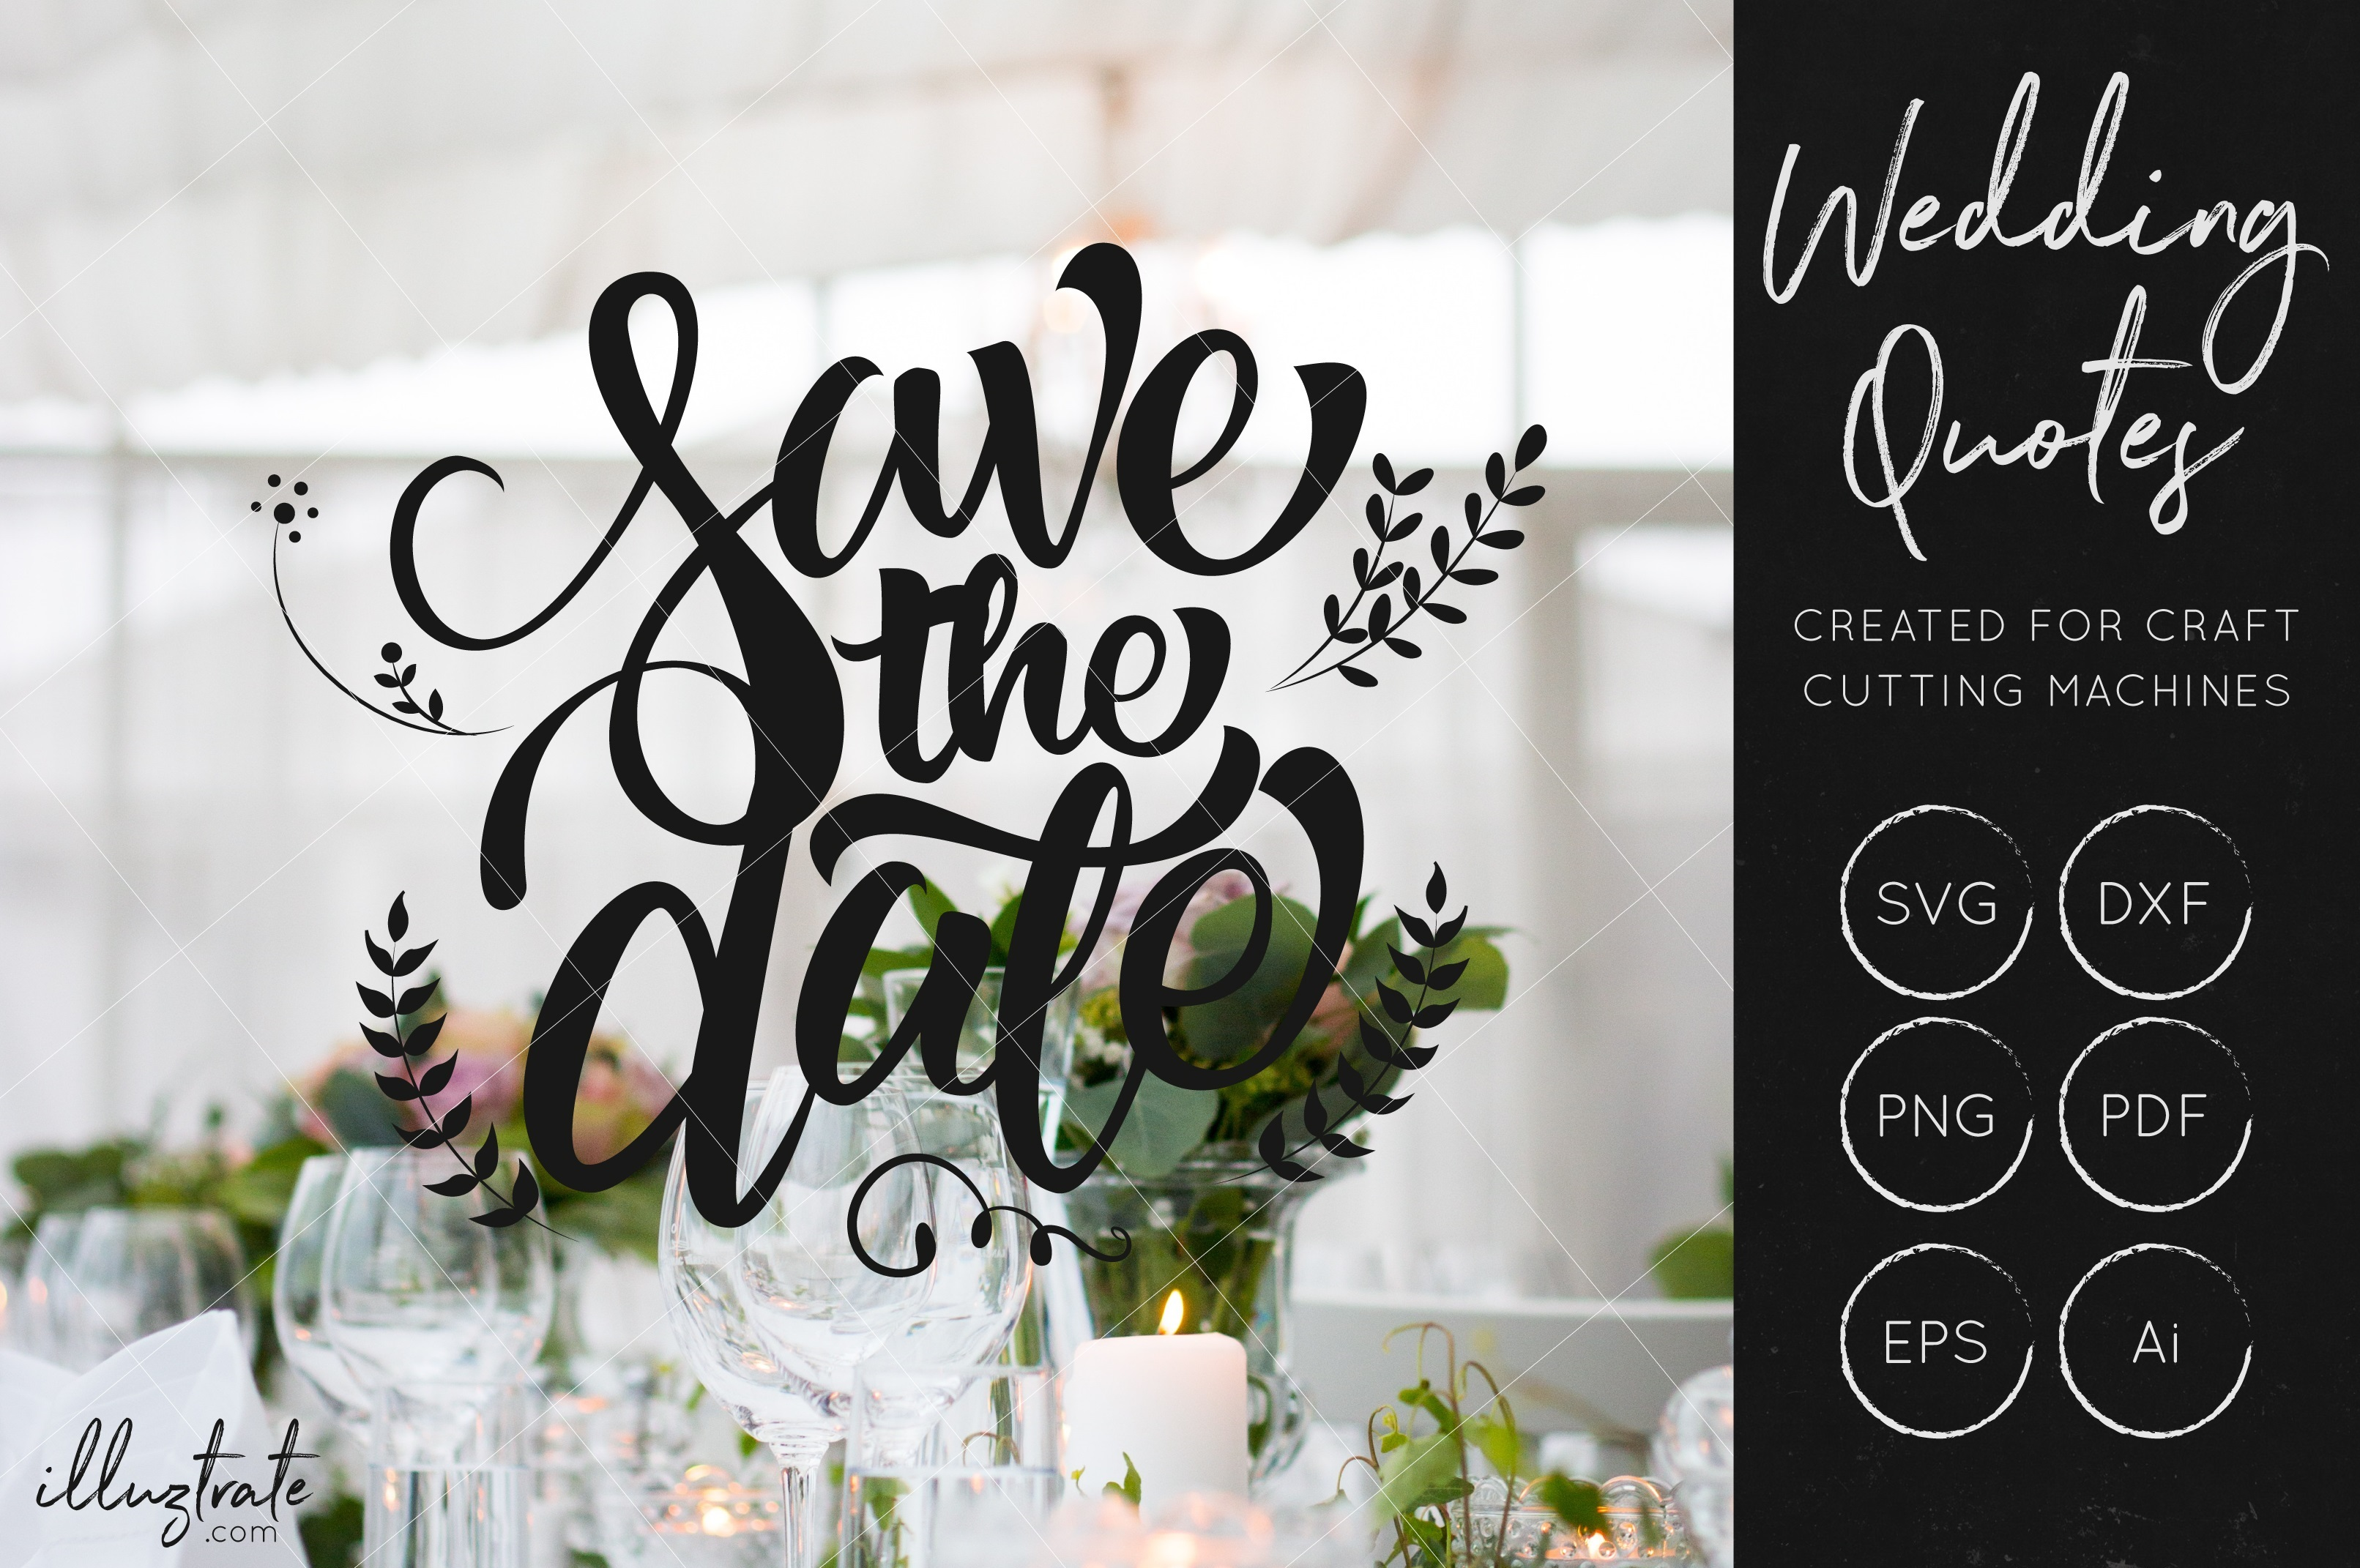 Wedding SVG Cut Files Bundle - Wedding Quotes - Wedding SVG example image 5